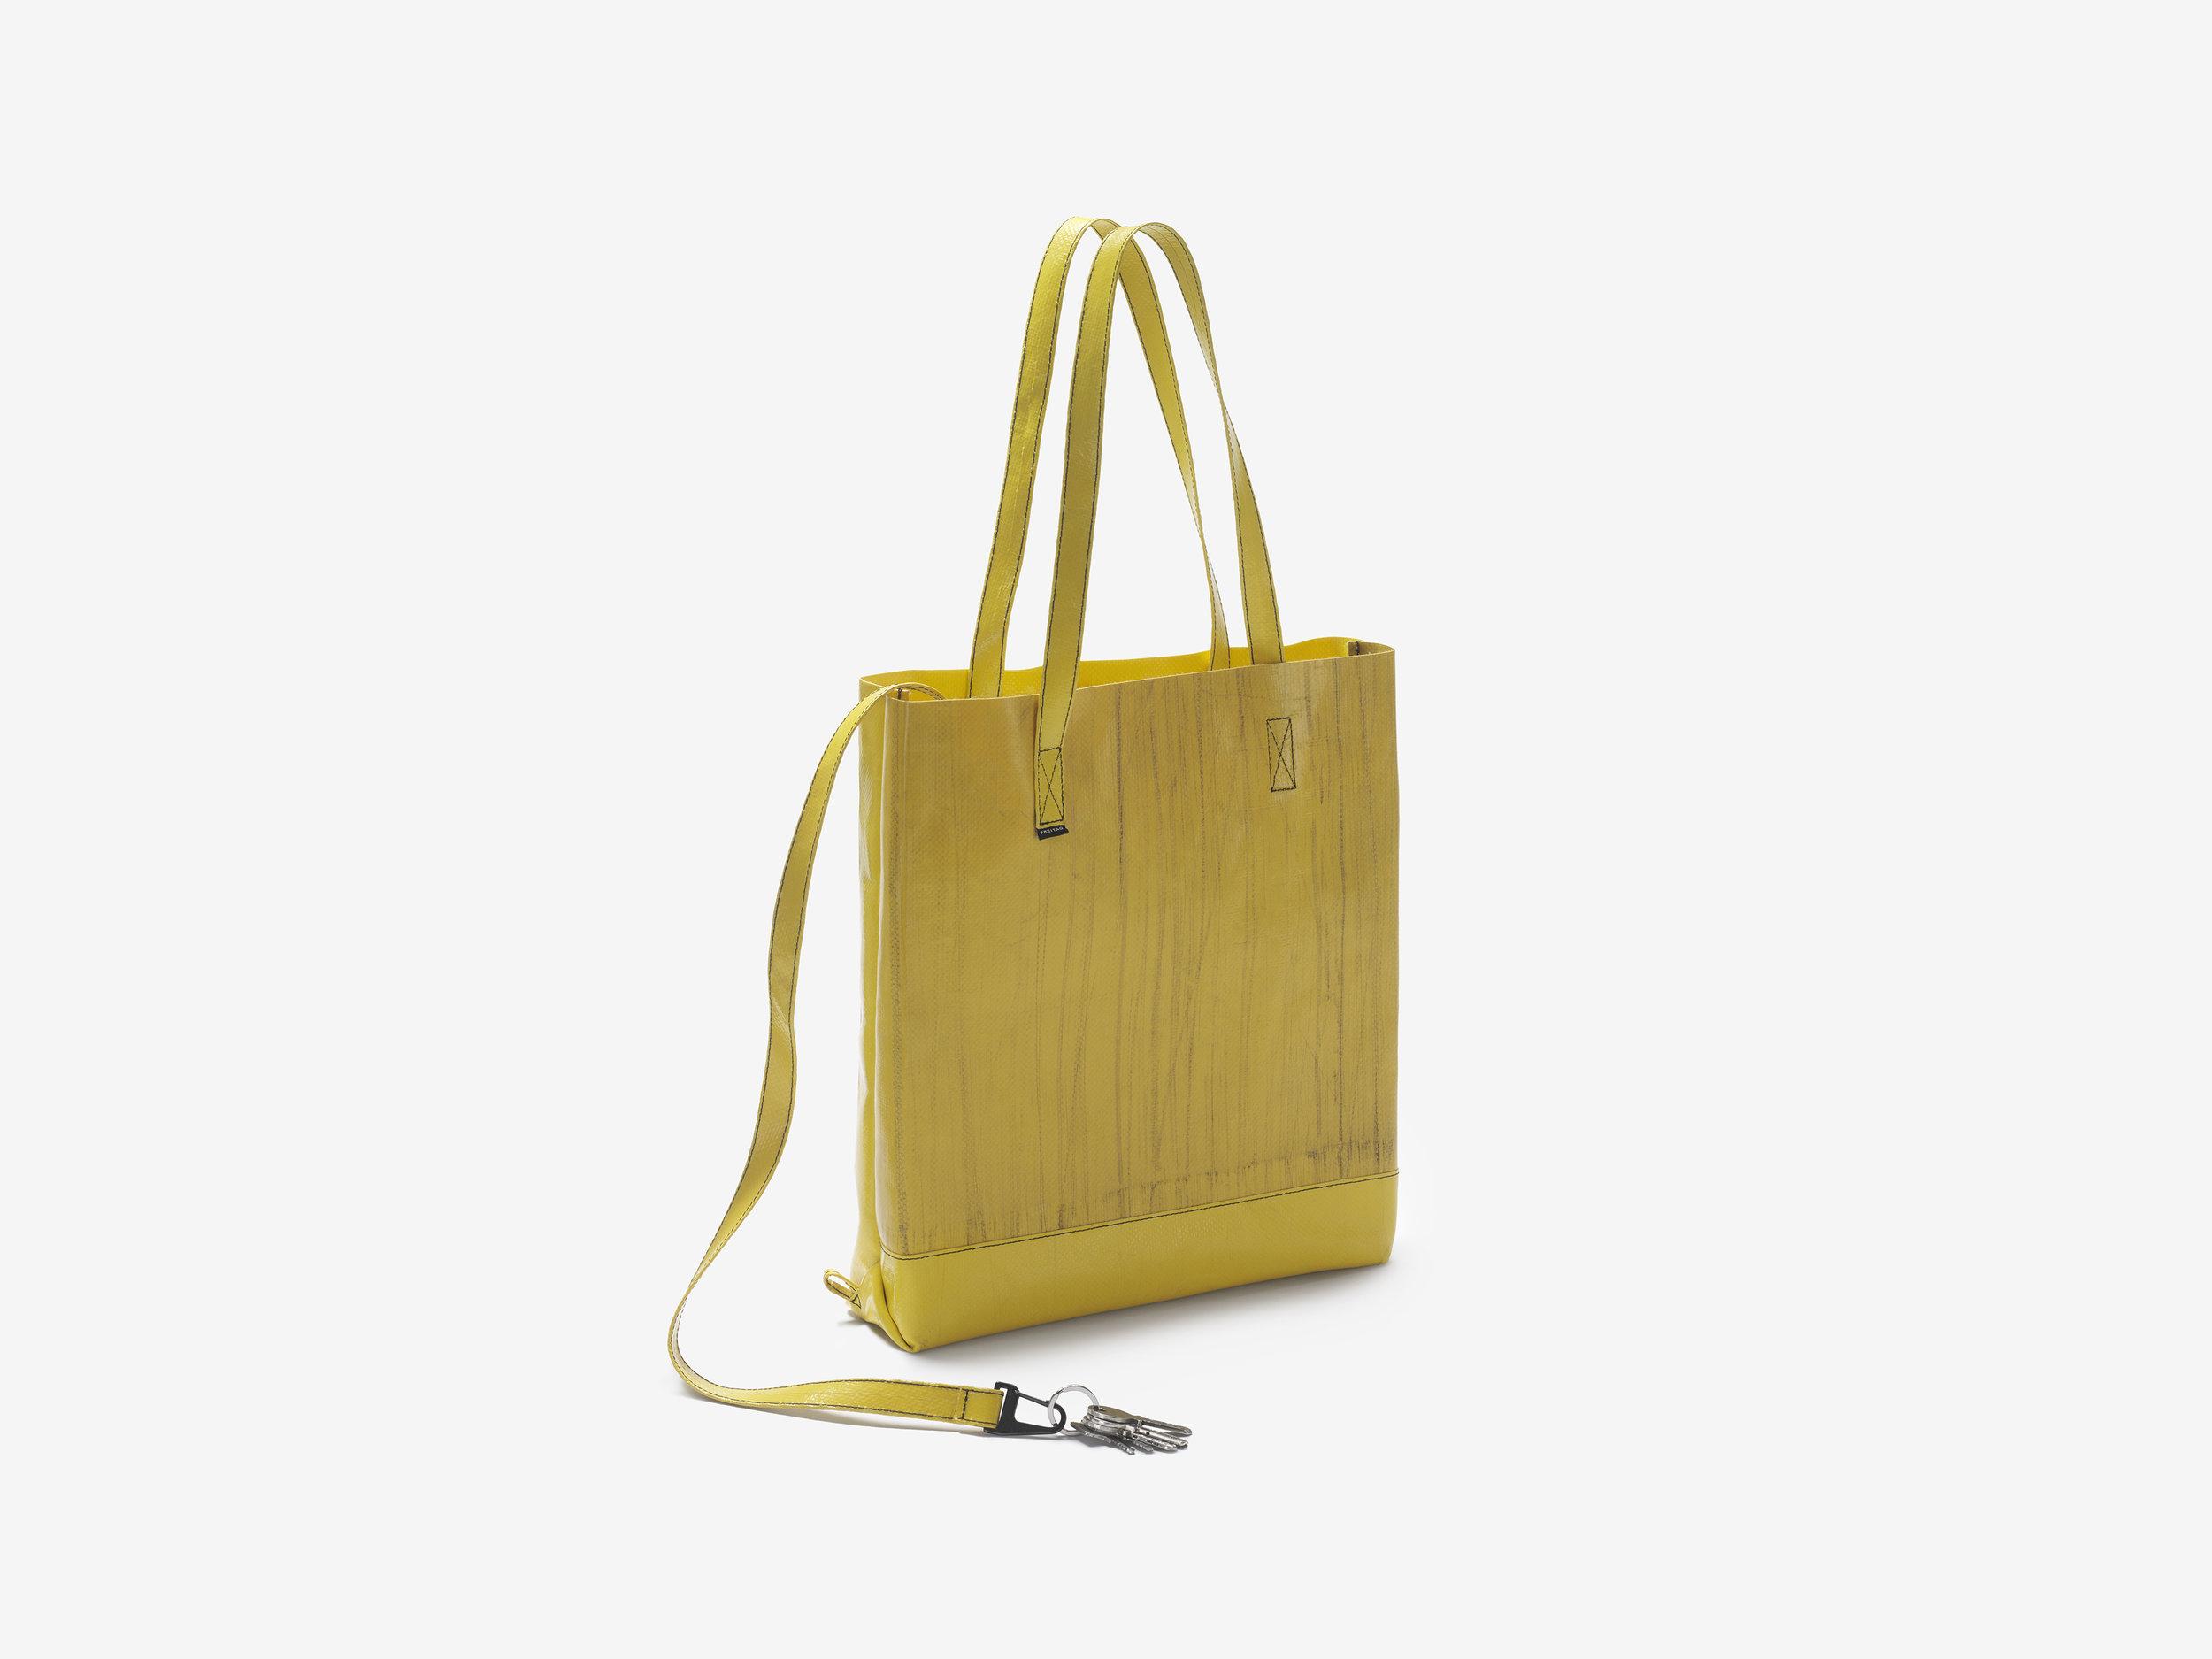 f261-maurice_yellow-keys_onanzig_highres_0.jpg